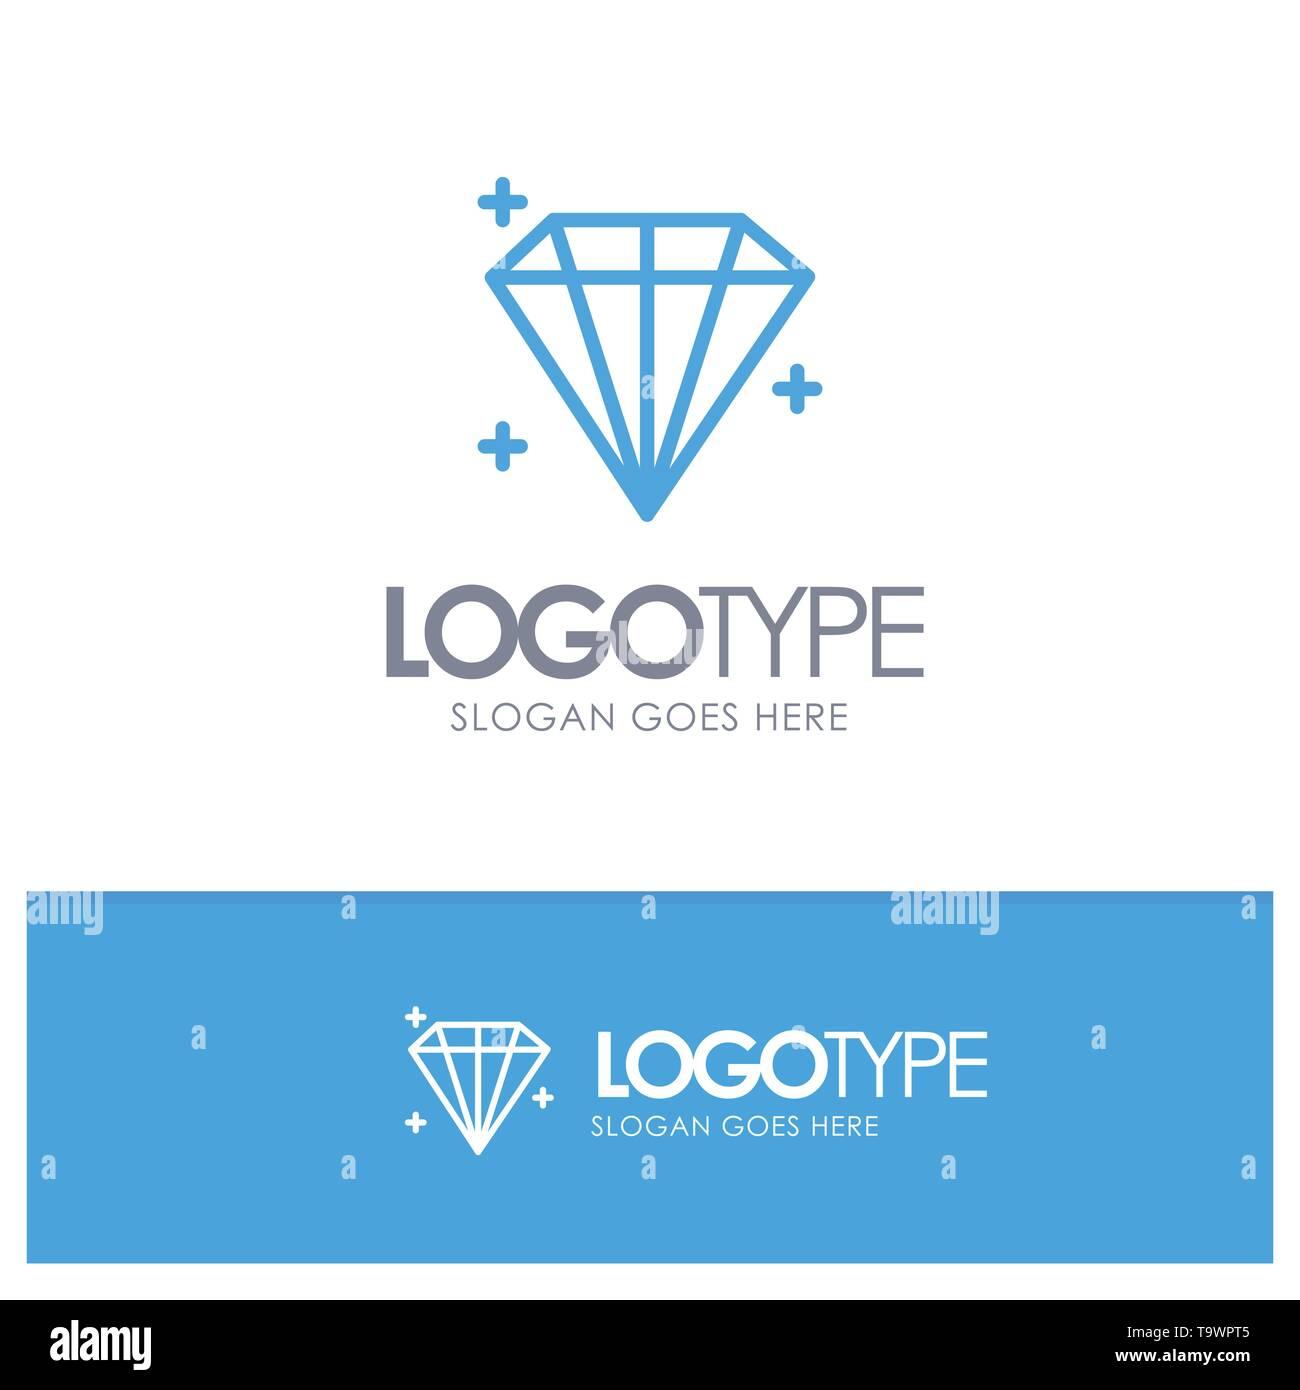 Diamond, Jewel, User Blue Outline Logo Place for Tagline - Stock Image